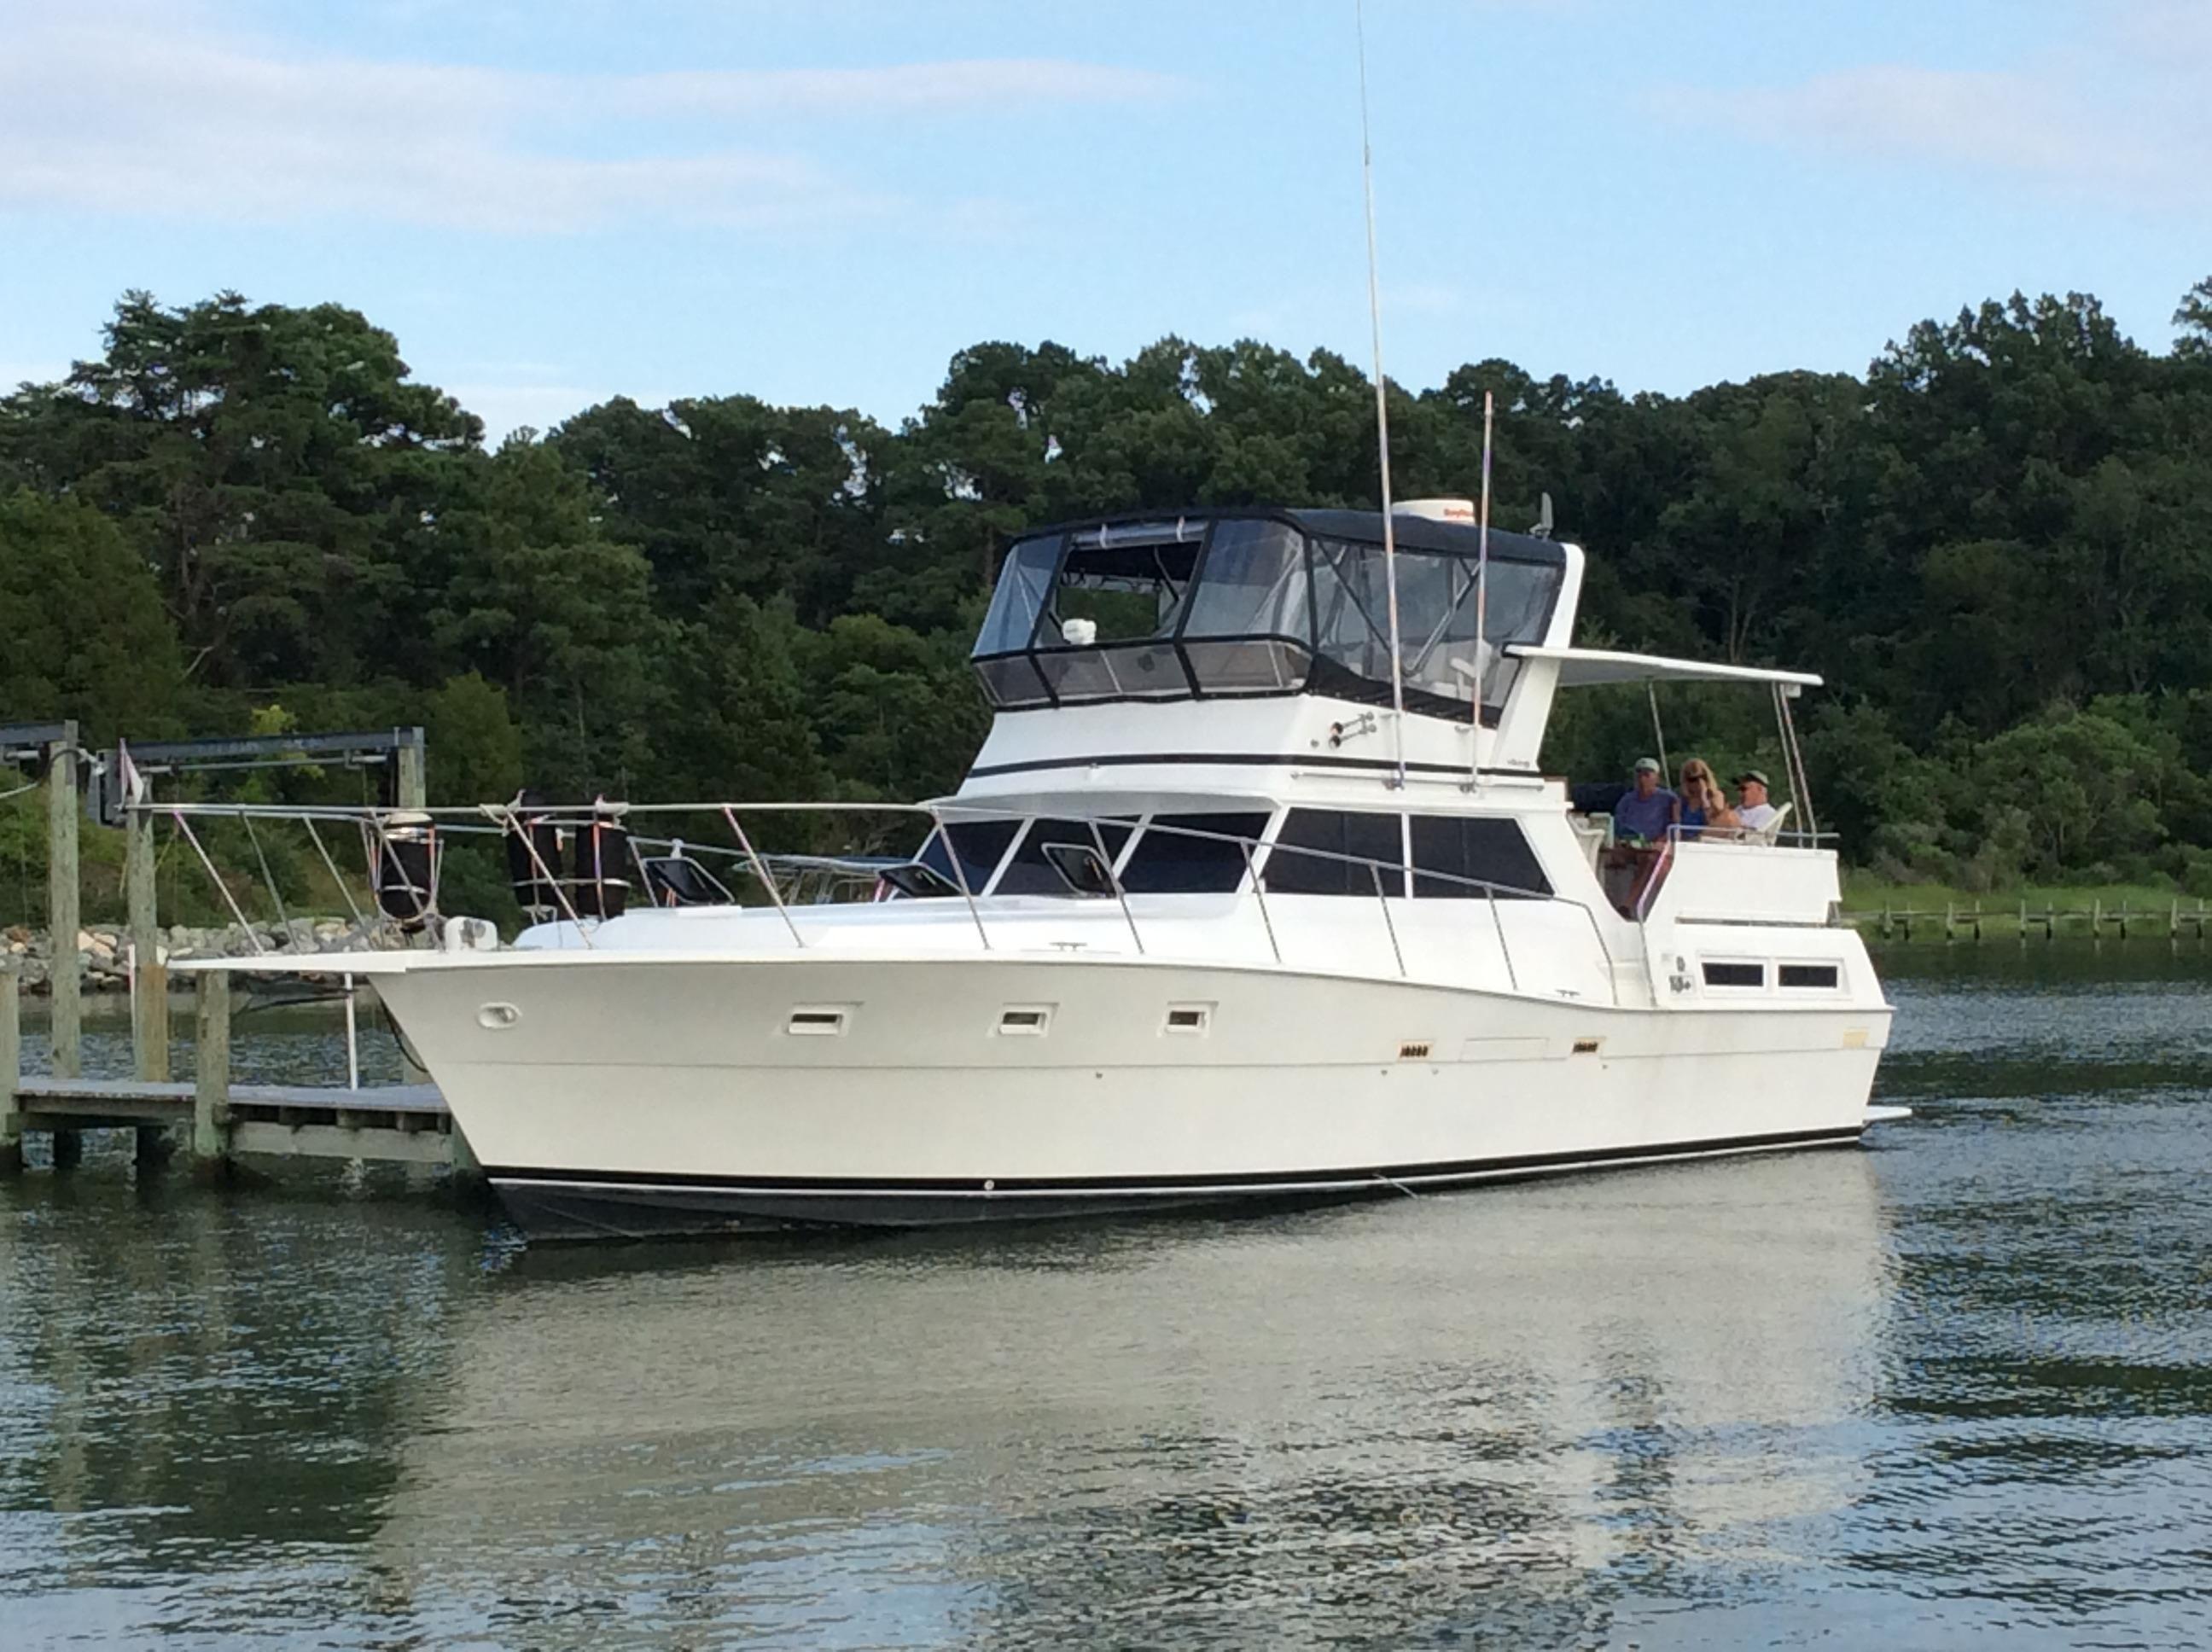 1981 viking 43 double cabin power boat for sale www for Viking 43 double cabin motor yacht